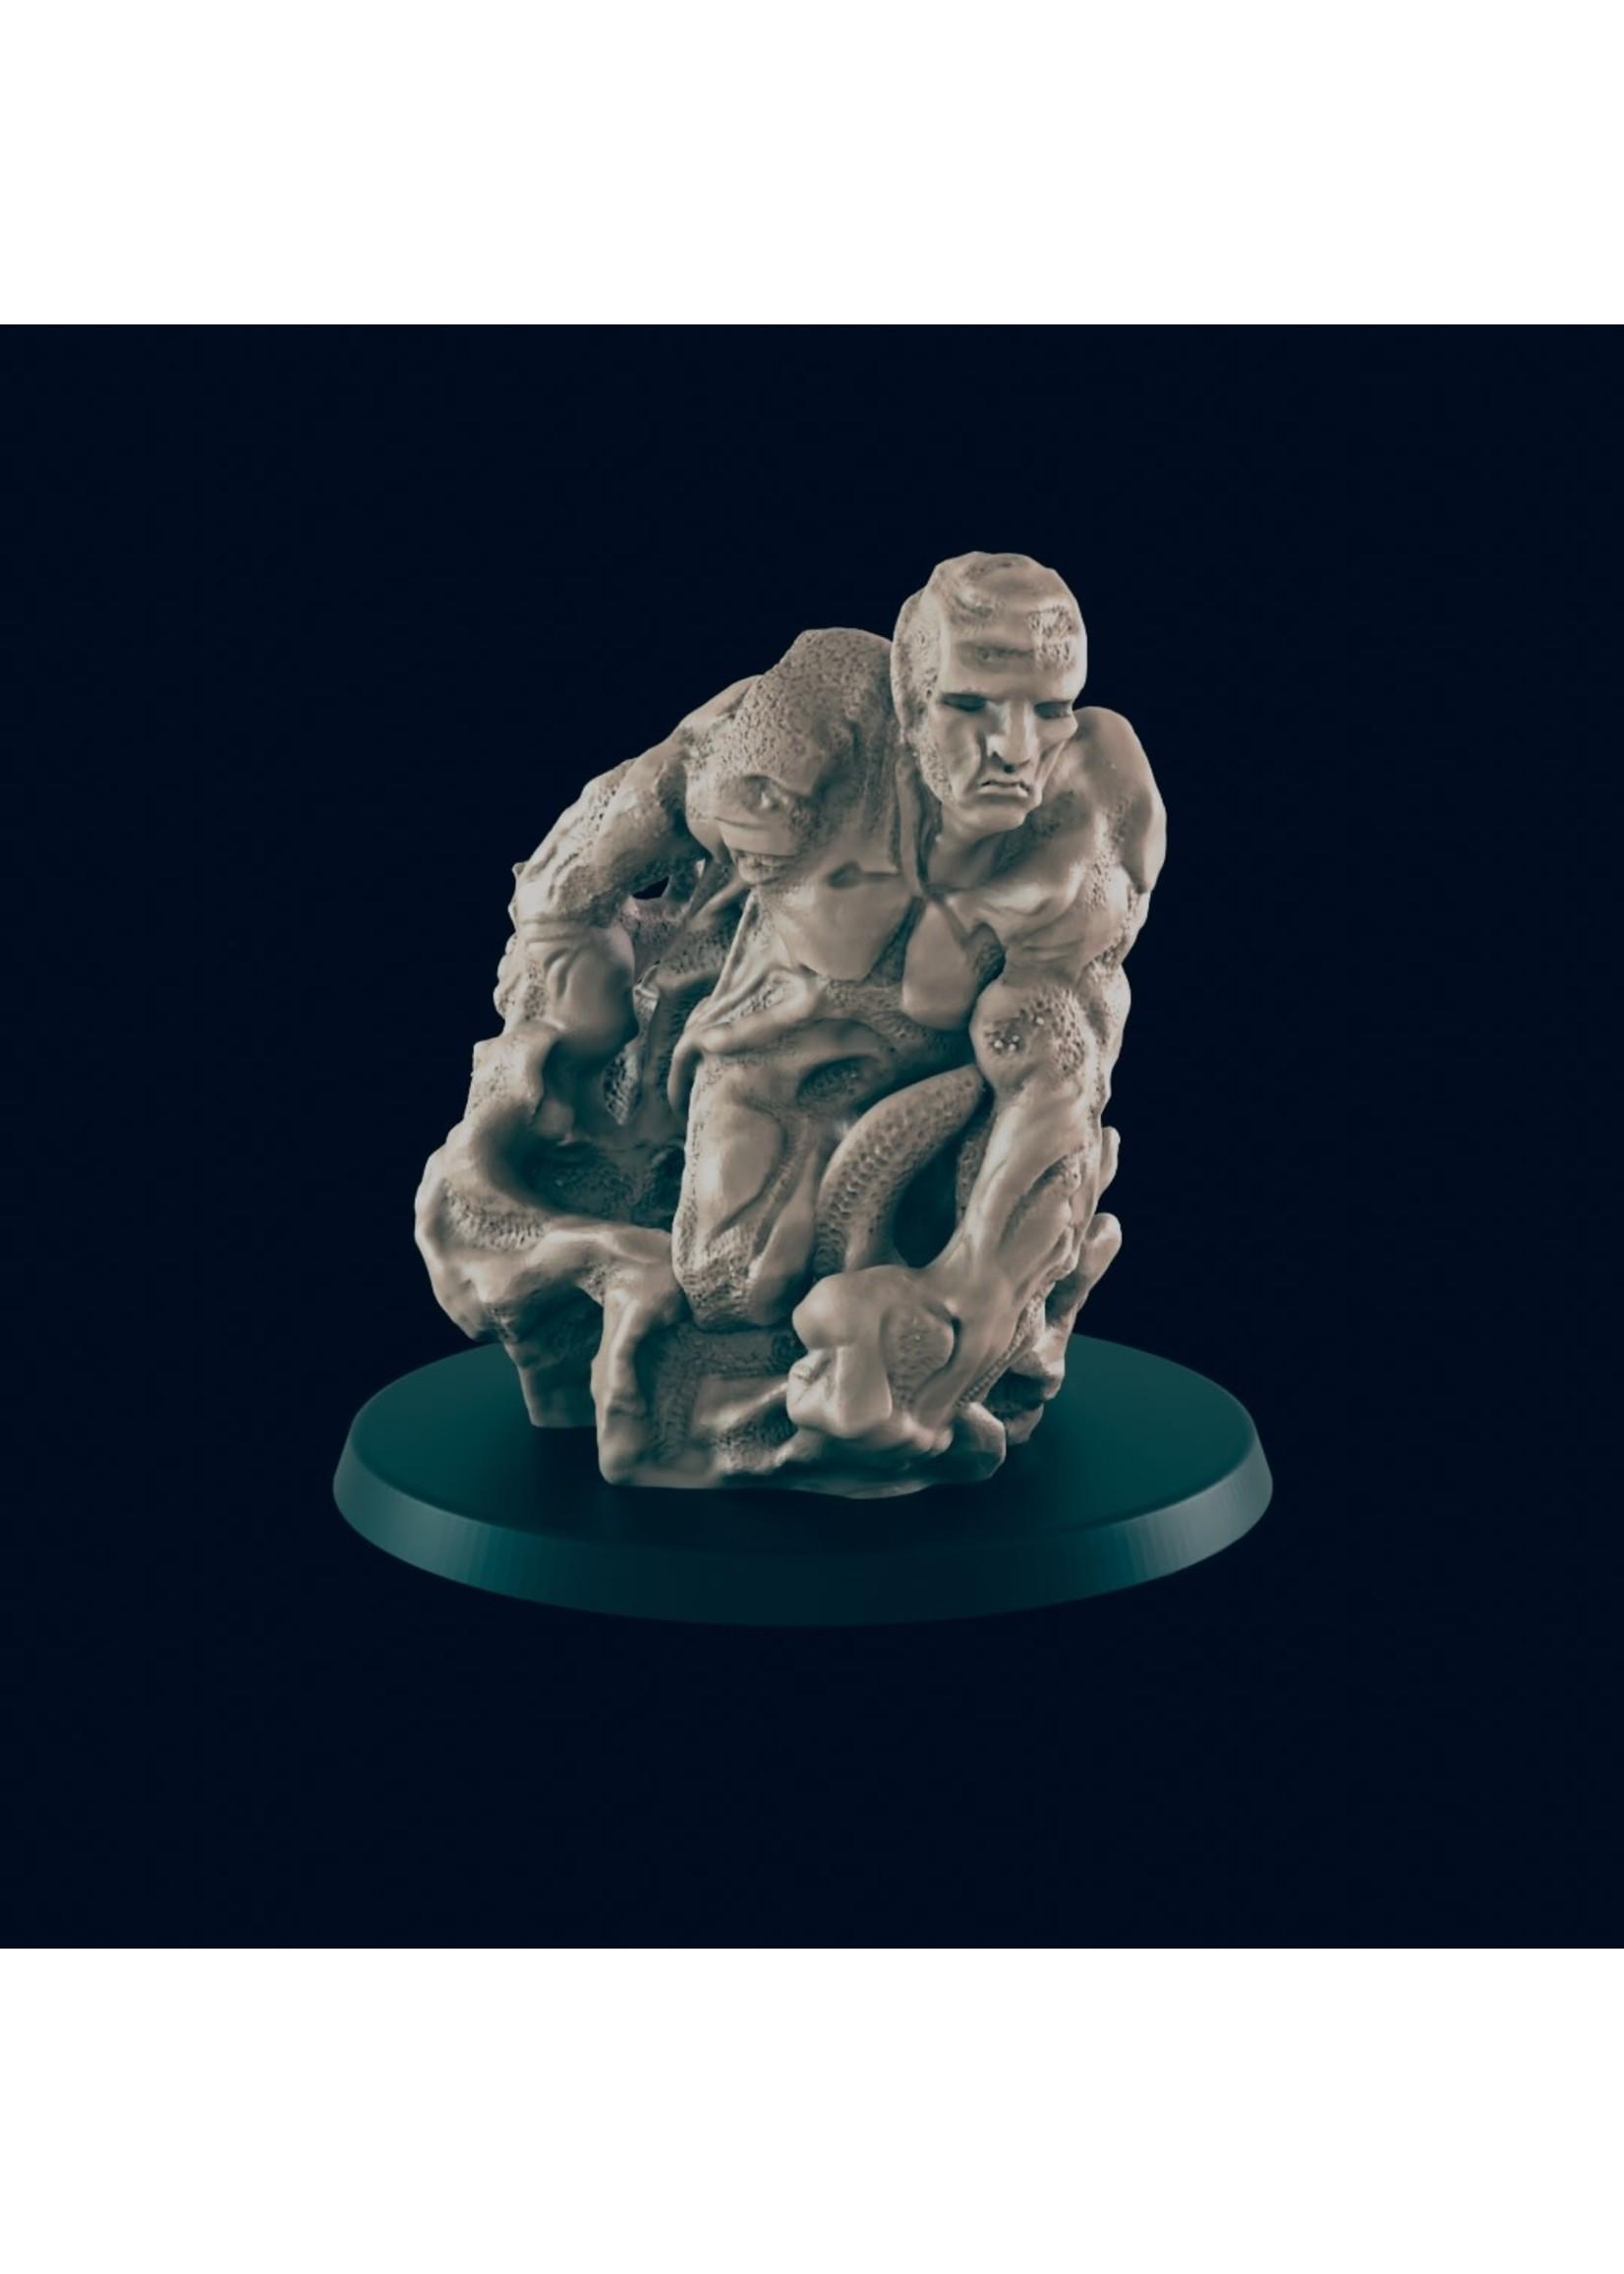 3D Printed Miniature - Sand Golem - Dungeons & Dragons - Beasts and Baddies KS